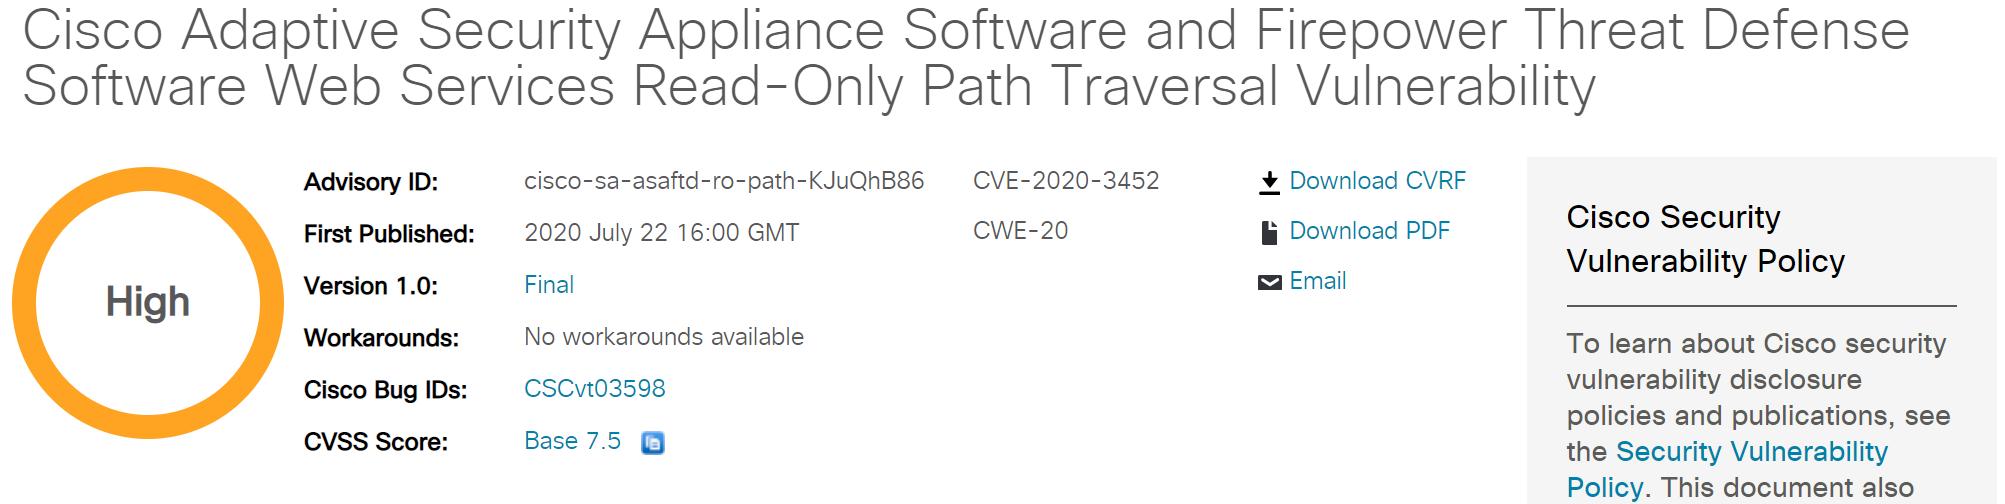 CVE-2020-3452: Cisco ASA/FTD Arbitrary File Reading Vulnerability Alert